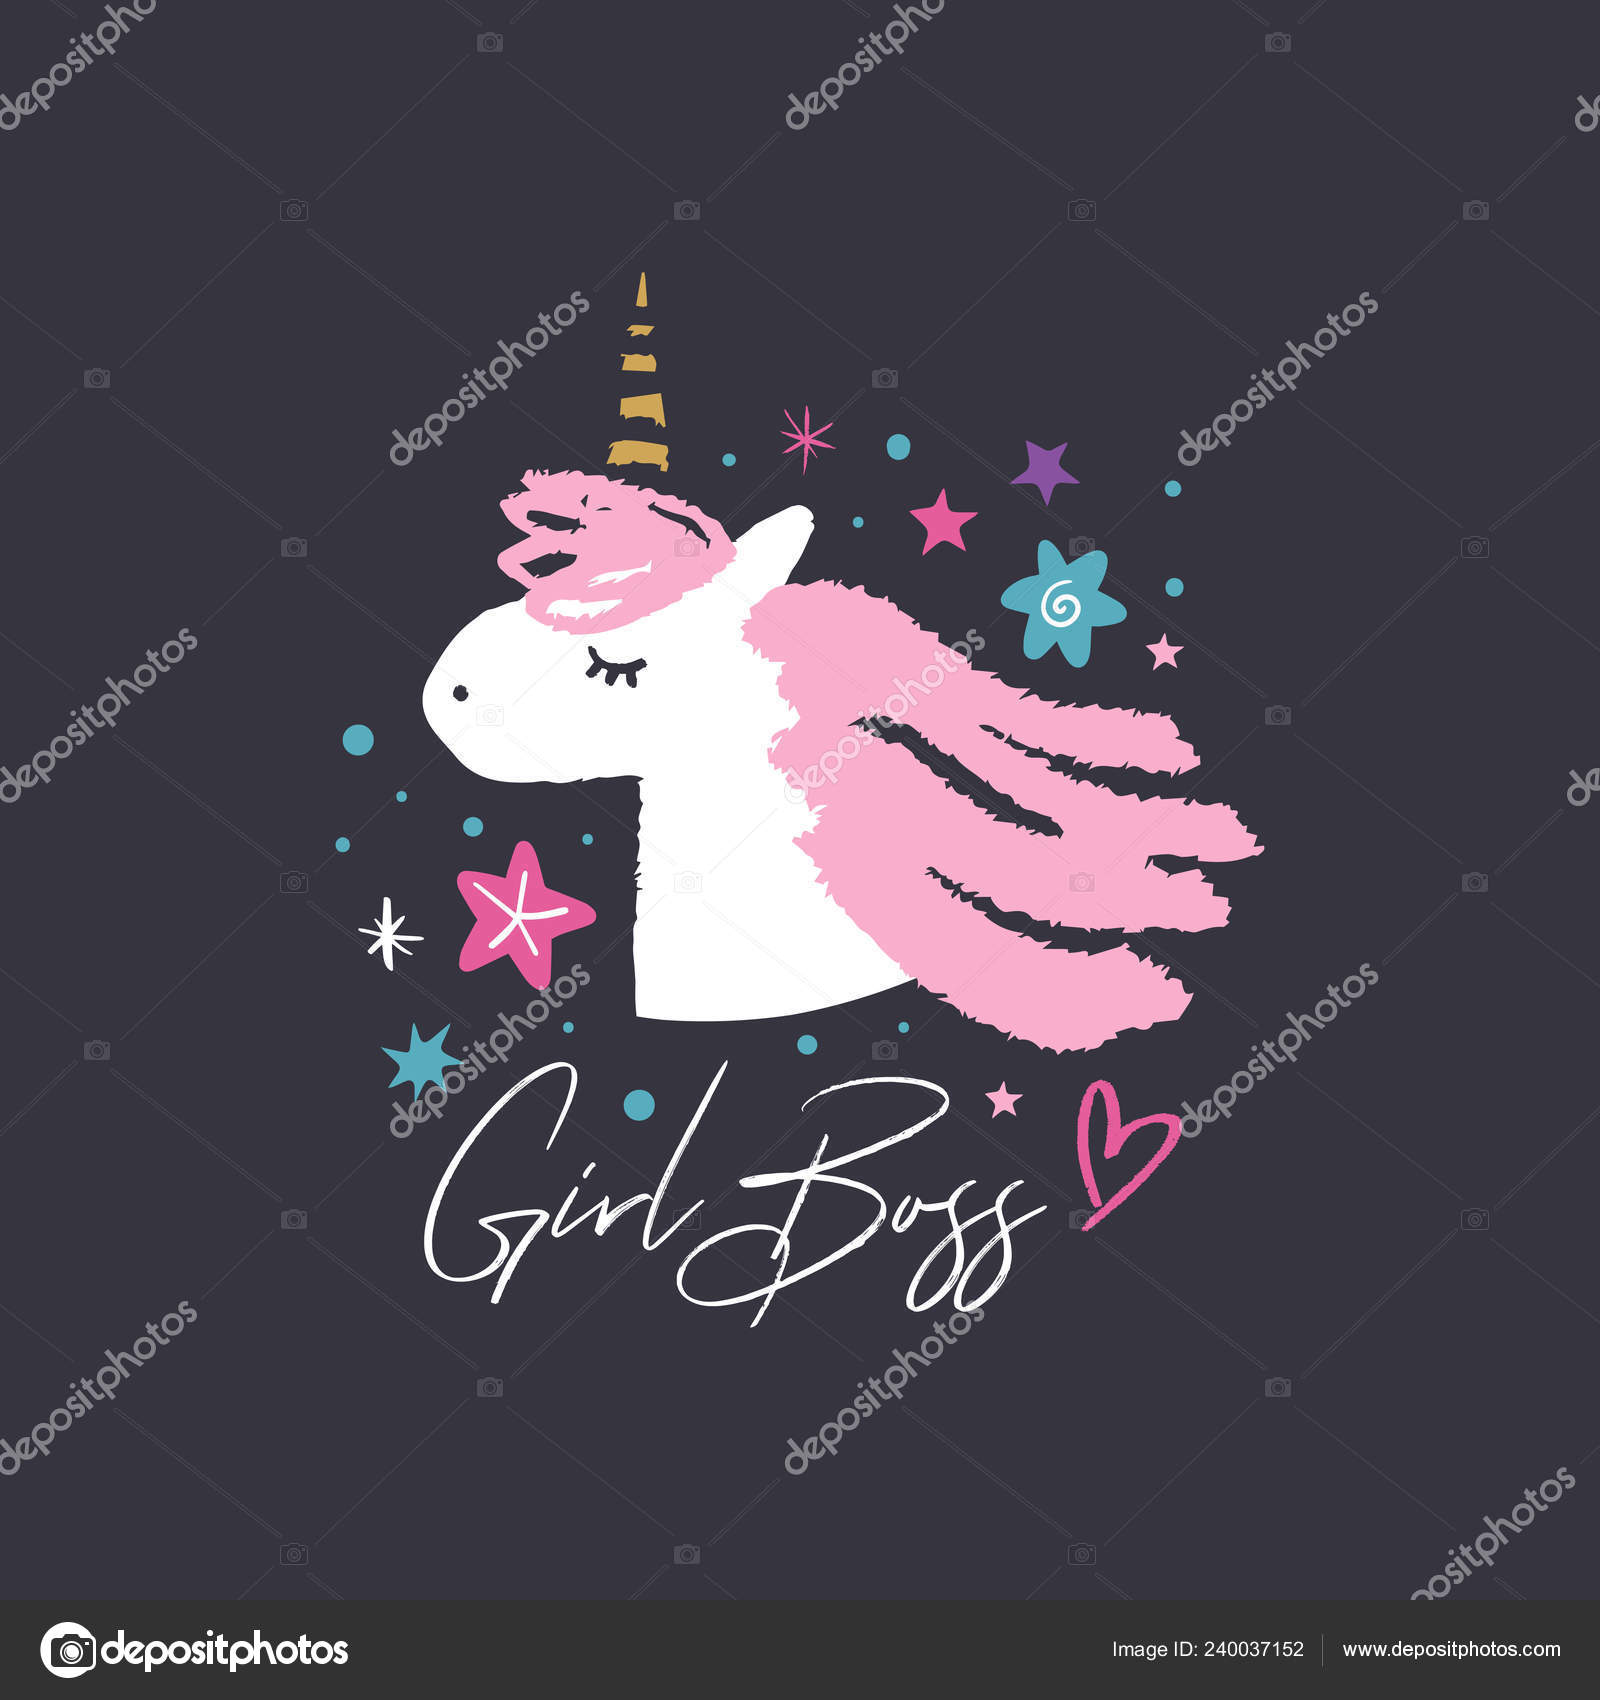 Clipart Boss Baby Girl Unicorn Head Cute Art Baby Stylish